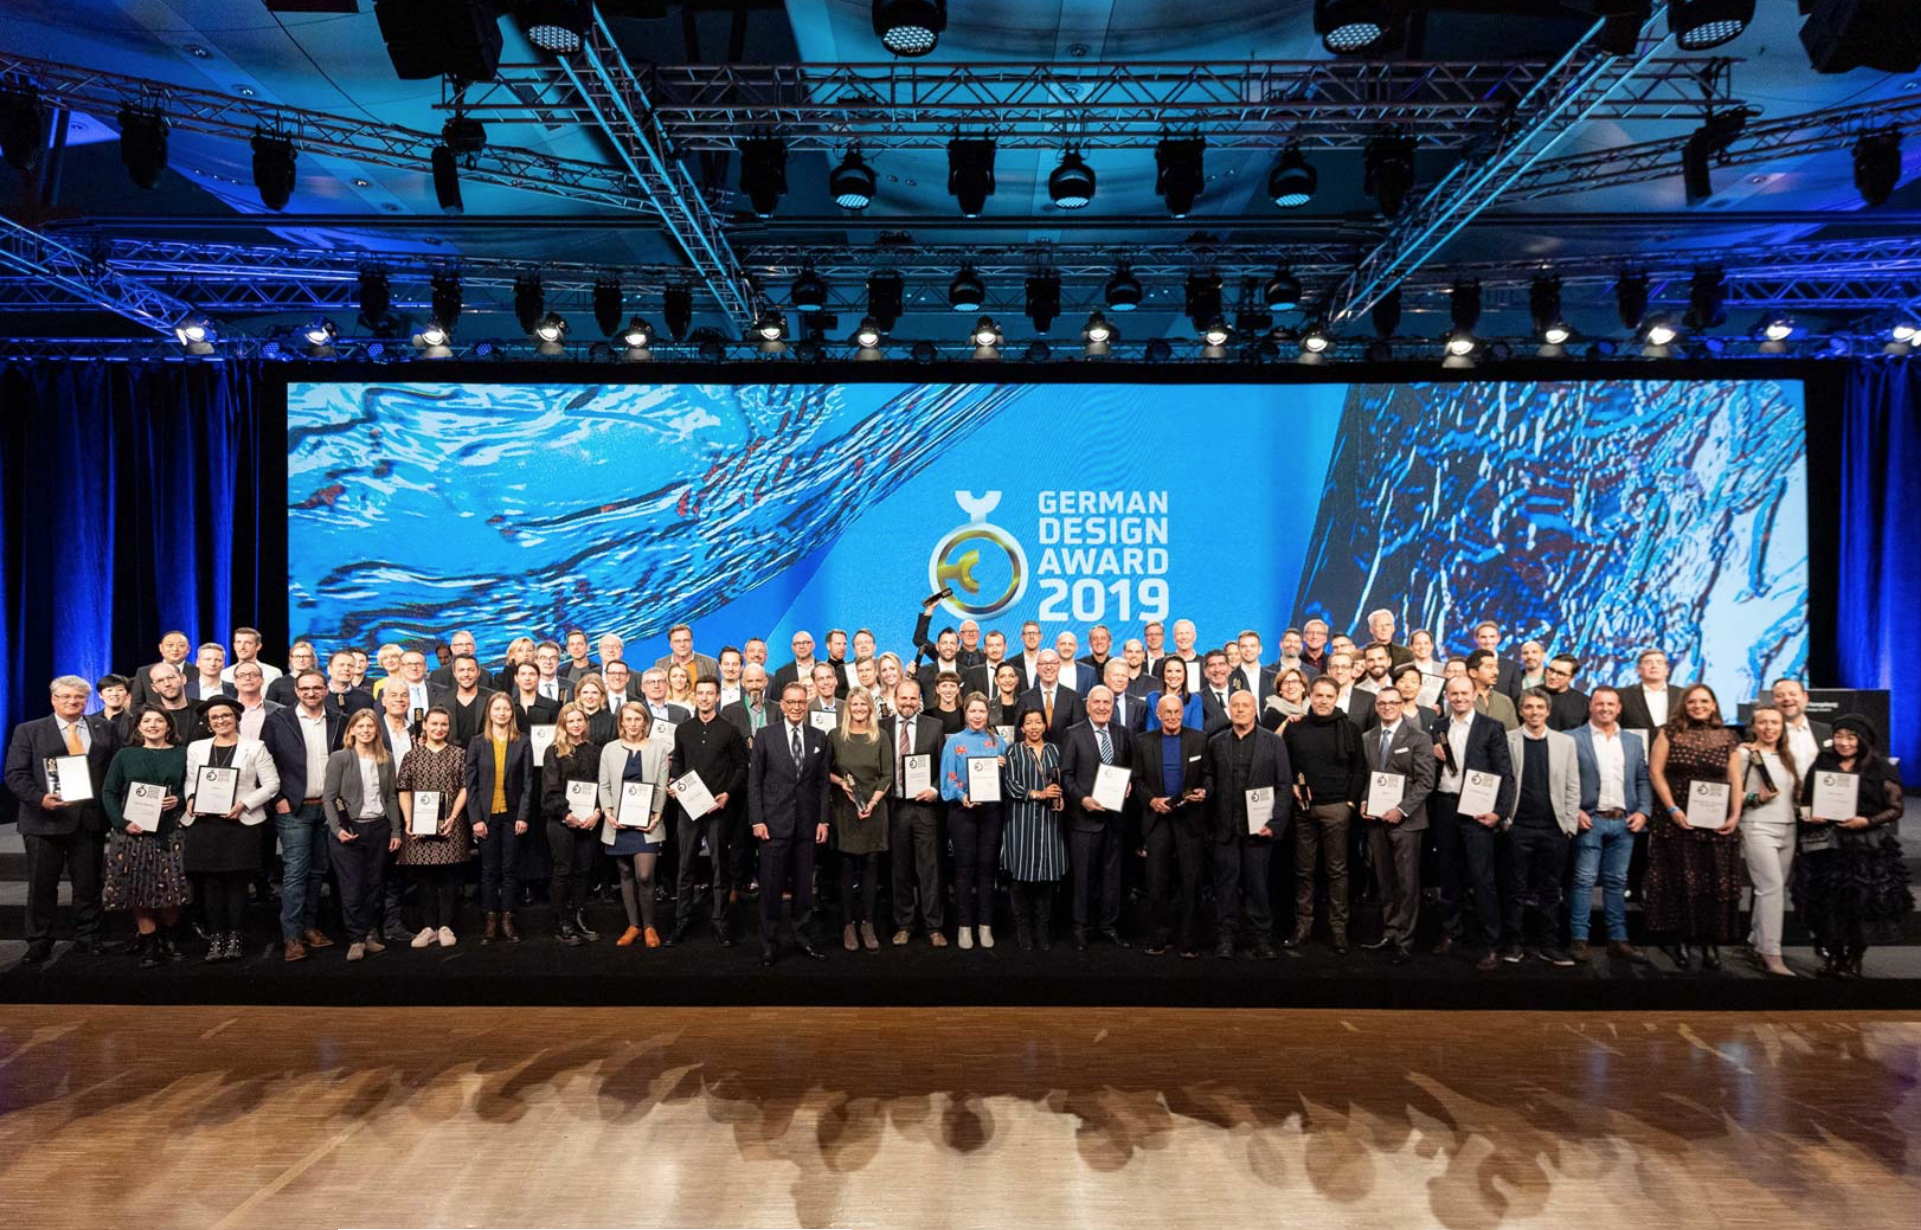 Verleihung_German_Design_Award_2019_Innen & Architektur_Studer_2.jpg.png